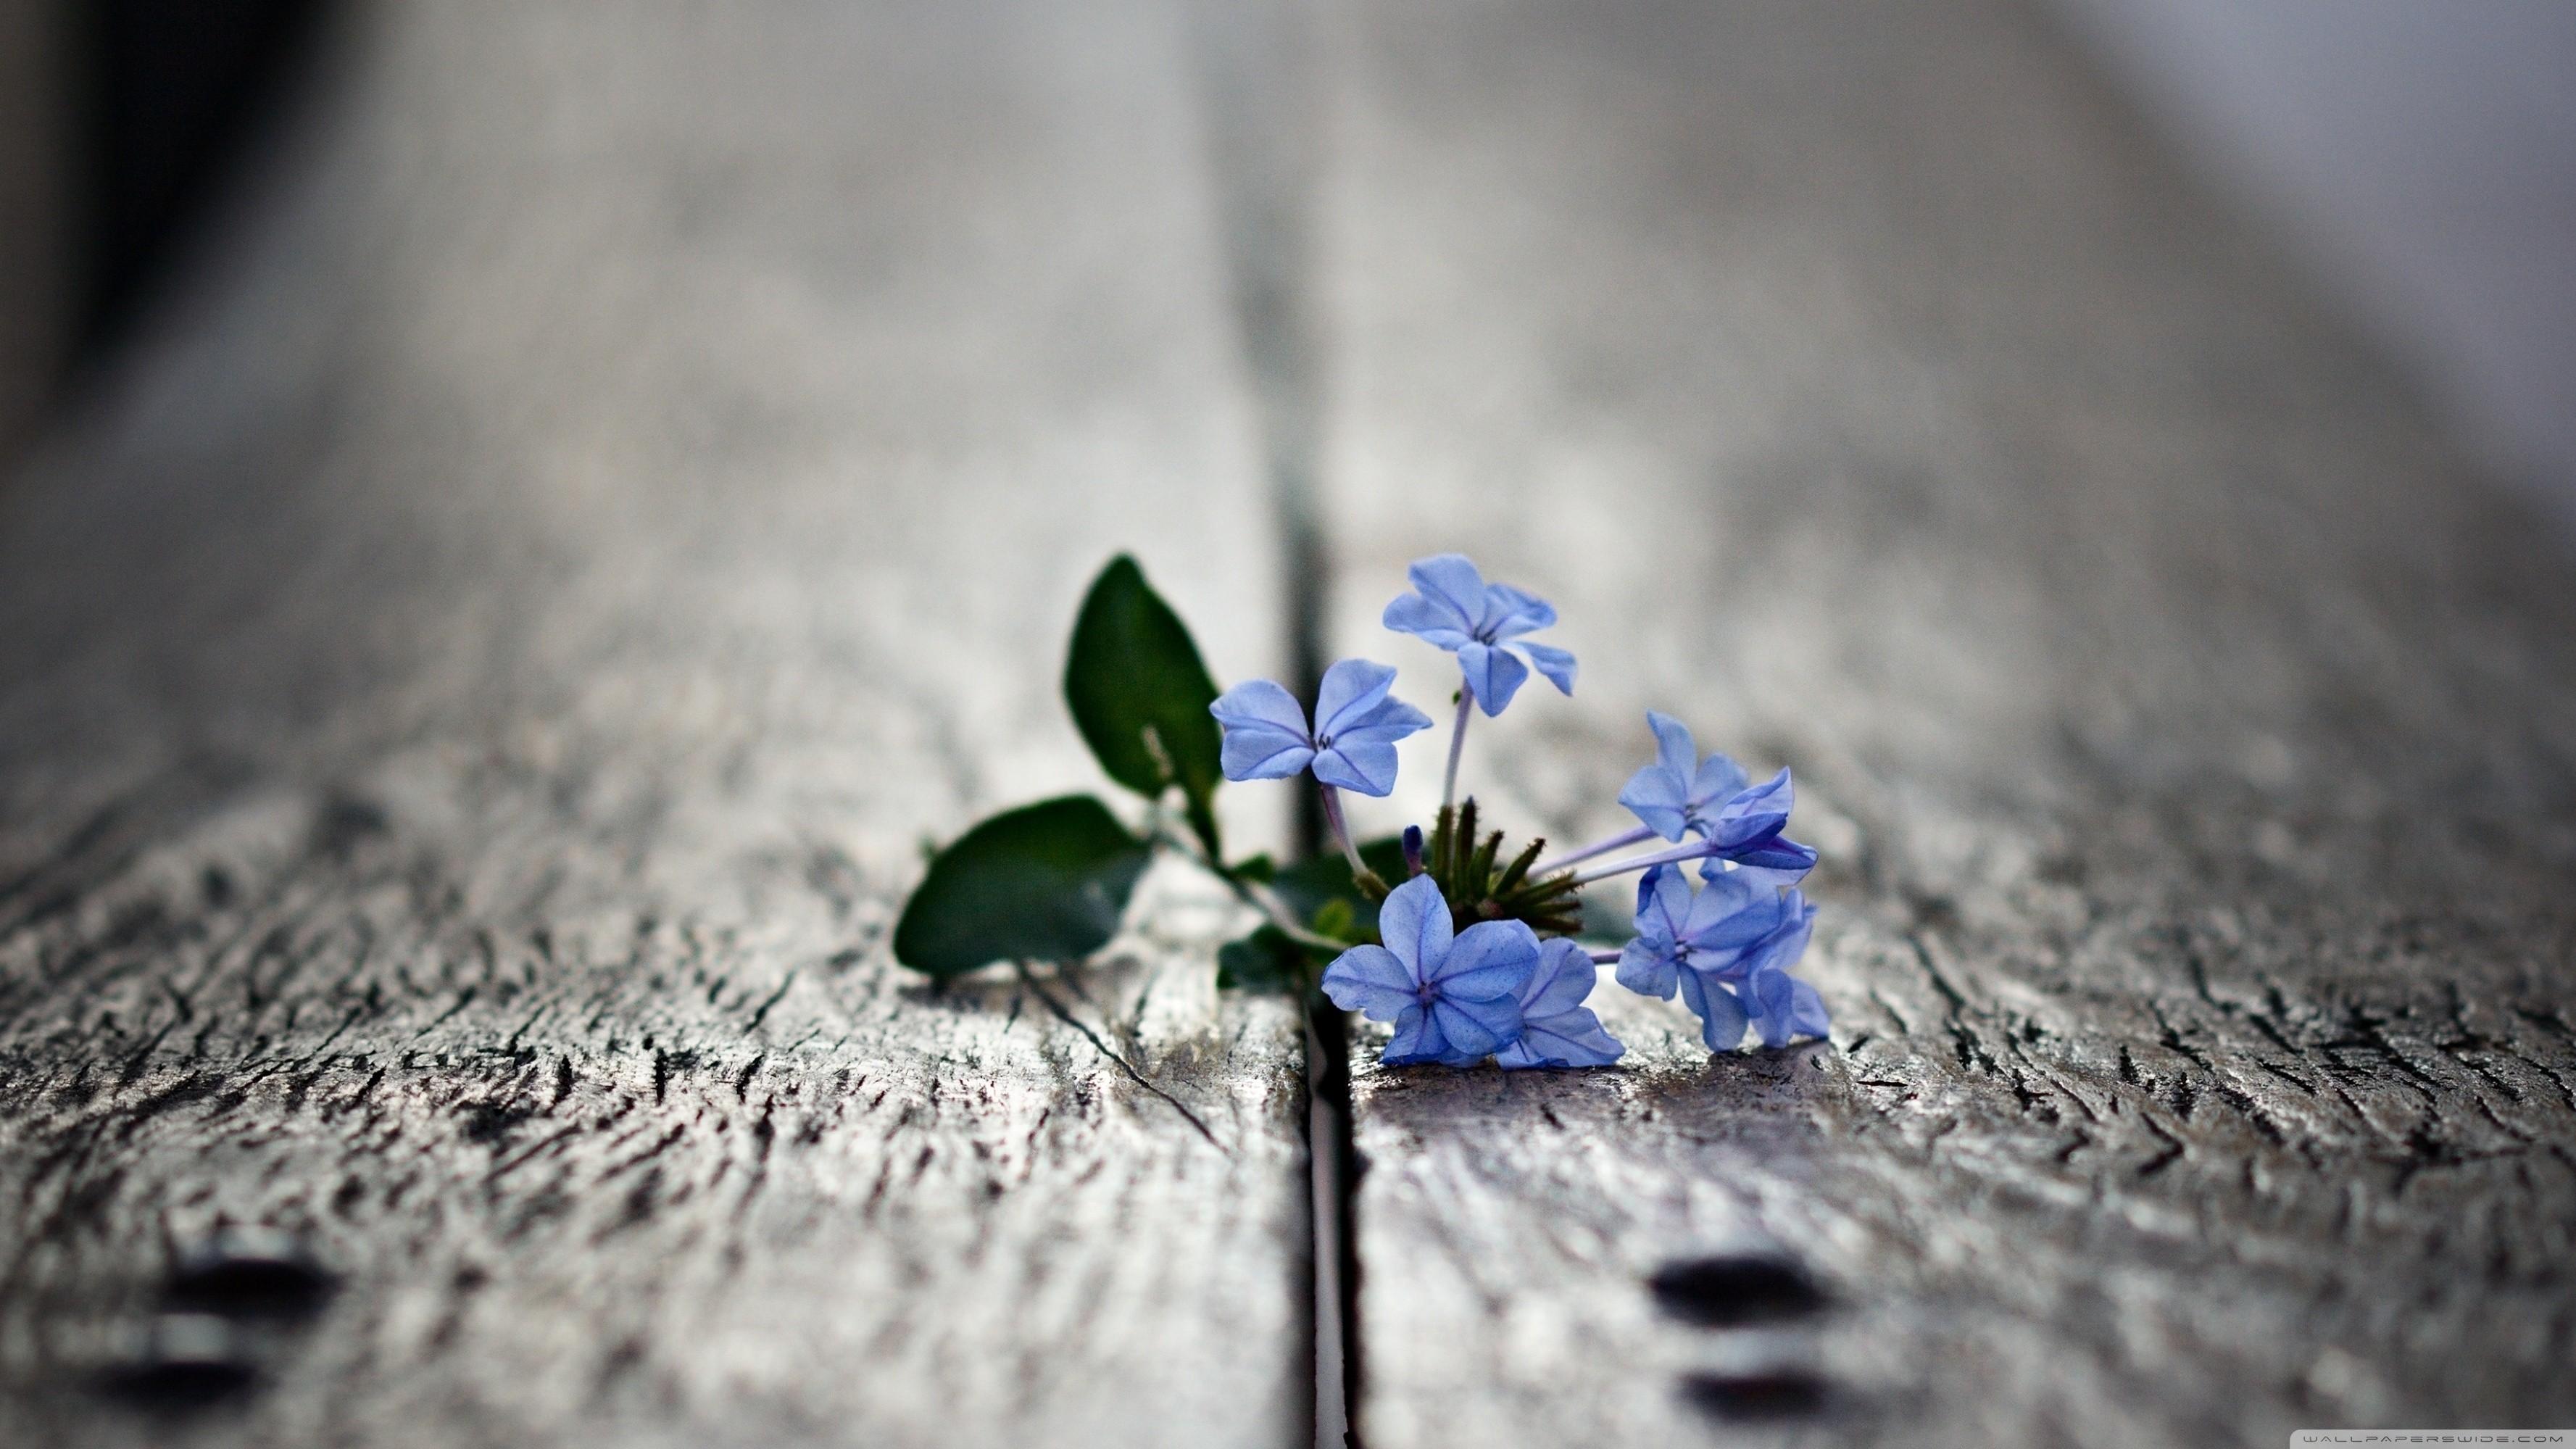 General 3554x1999 wooden surface flowers macro depth of field blue flowers